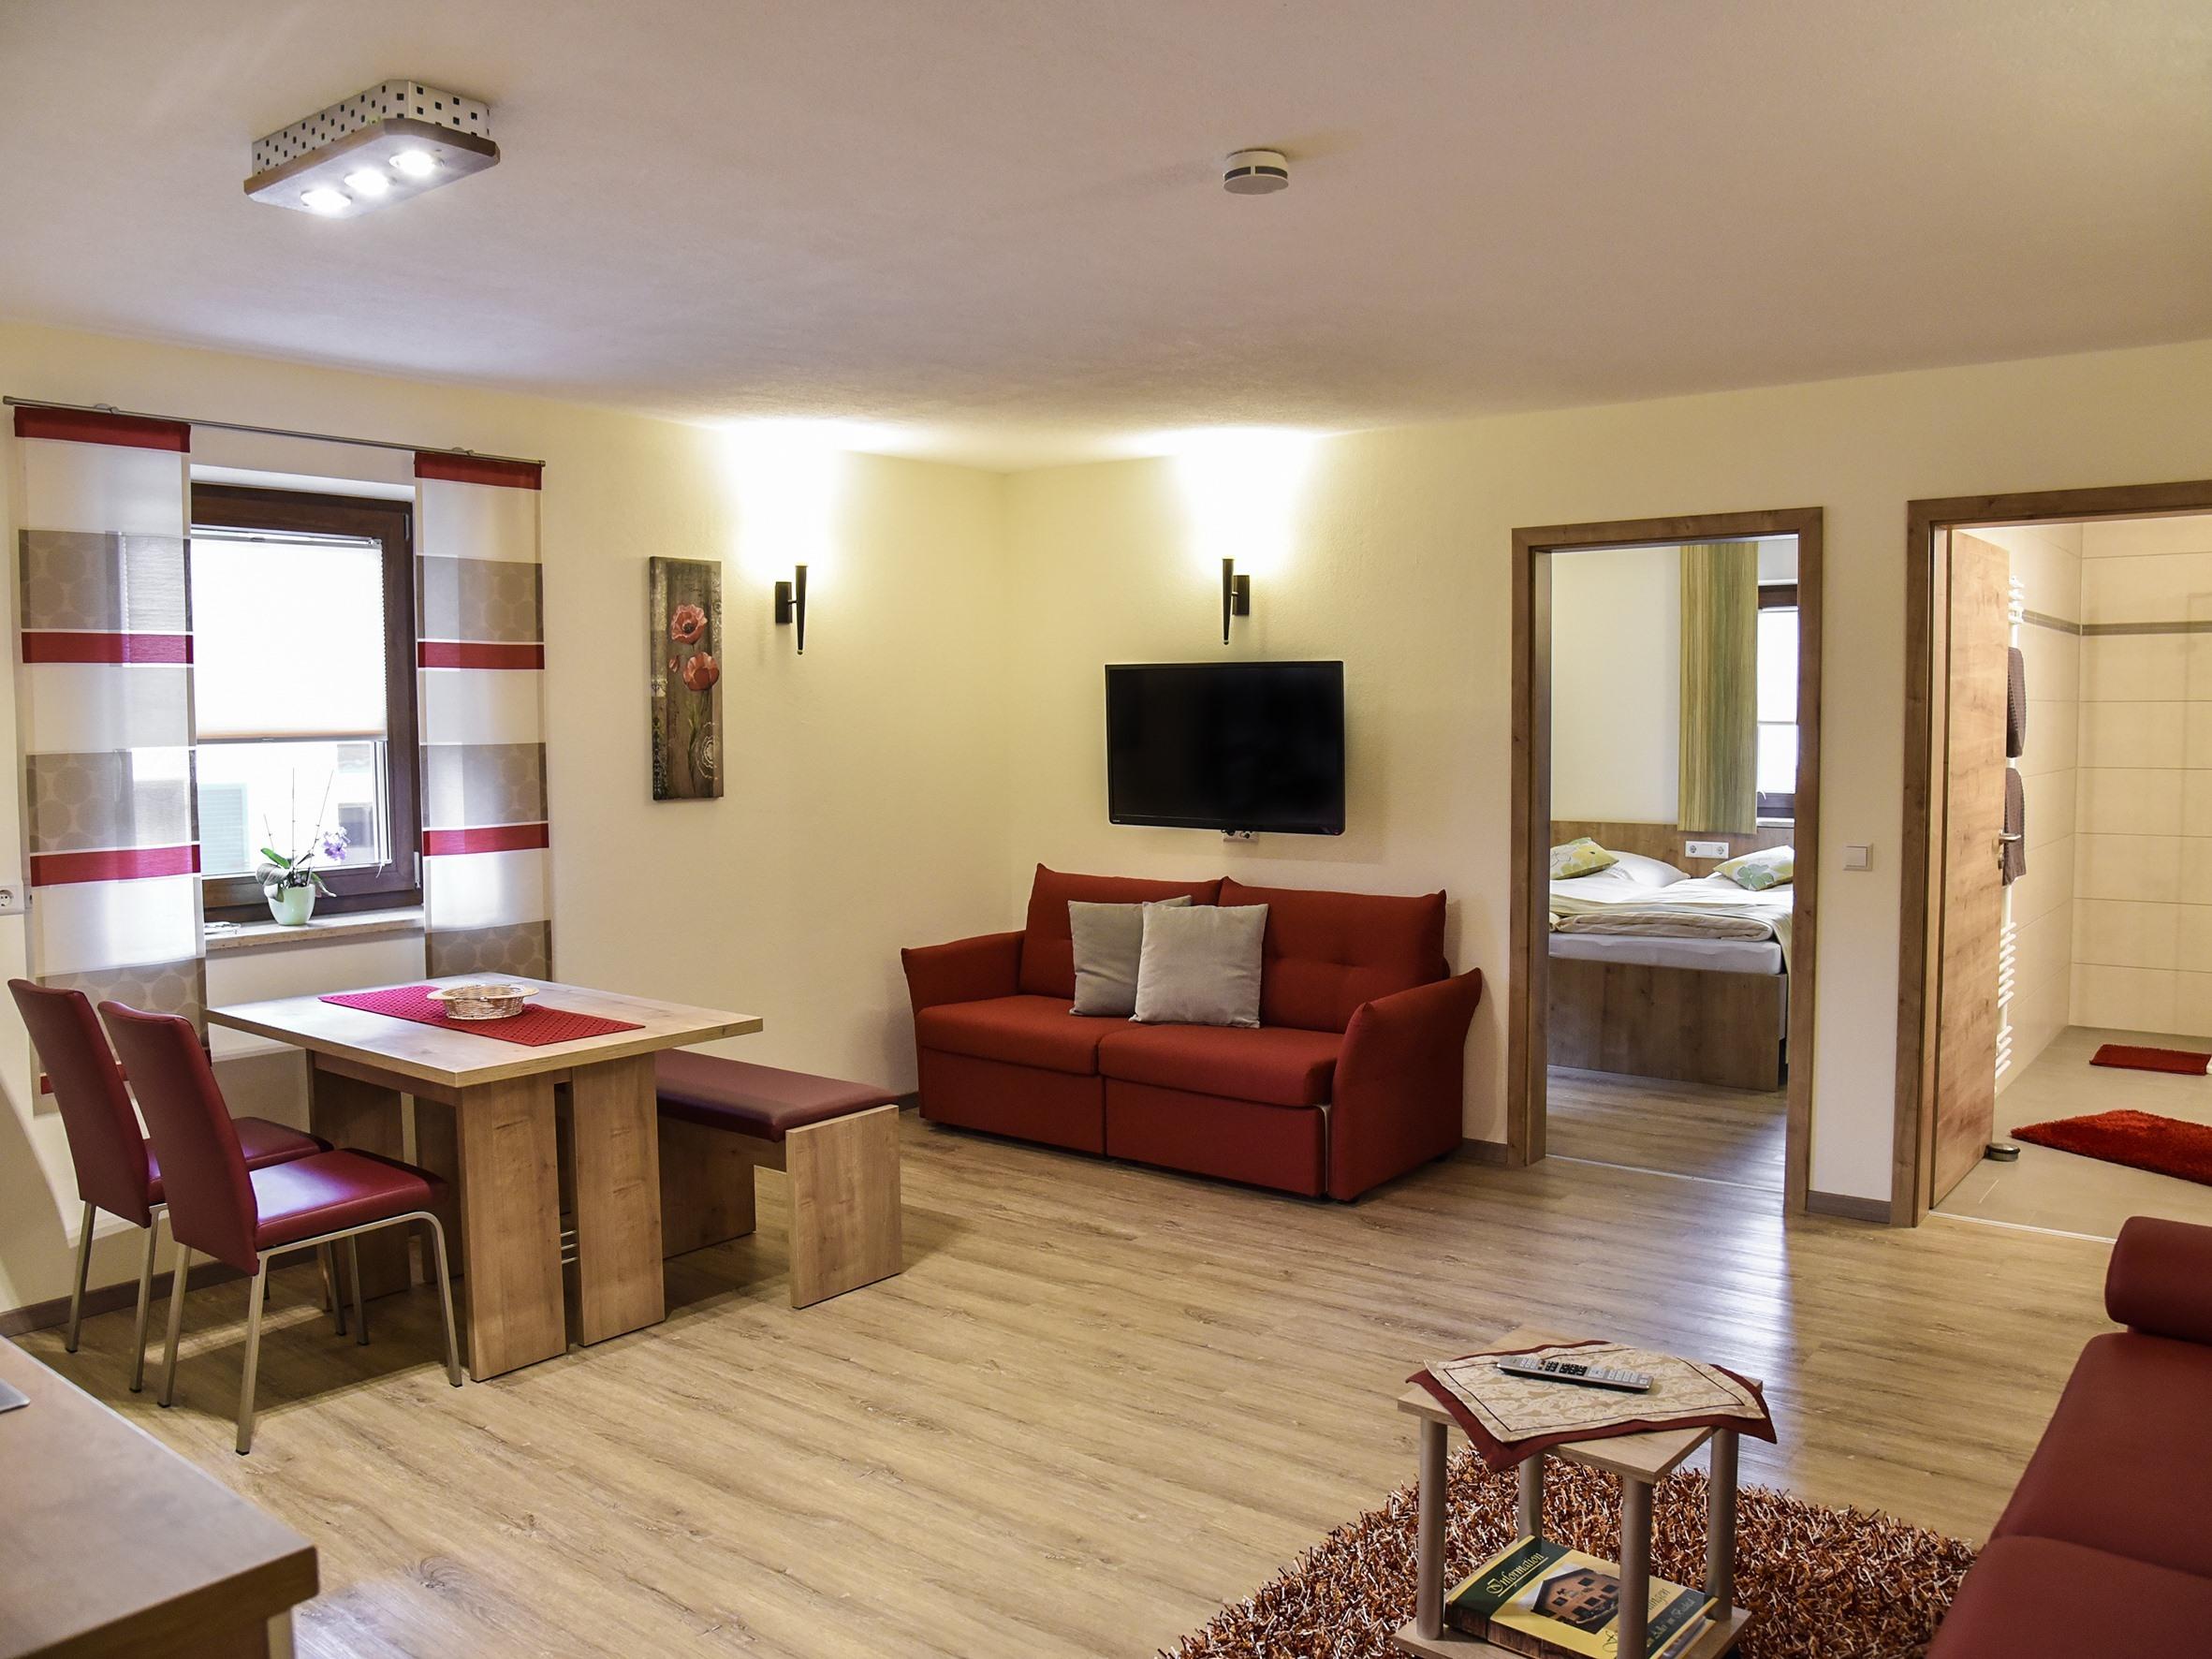 Apartment-Standard-Eigenes Badezimmer - Basistarif